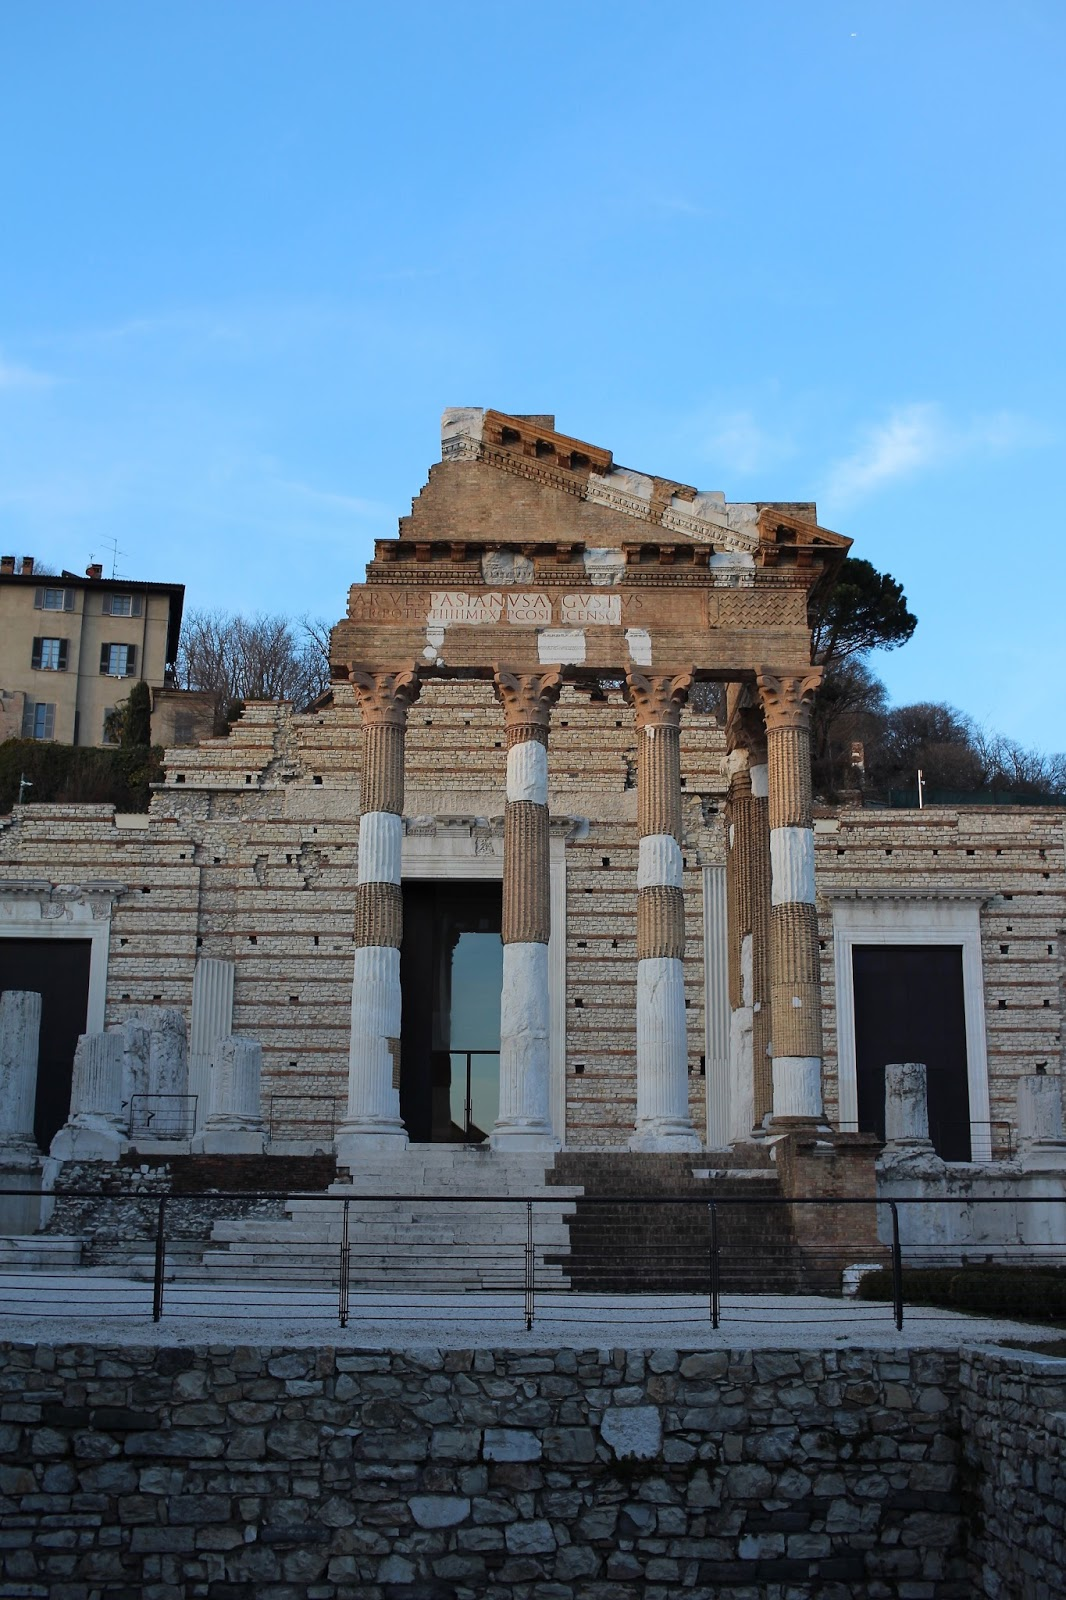 brescia travel blog italy